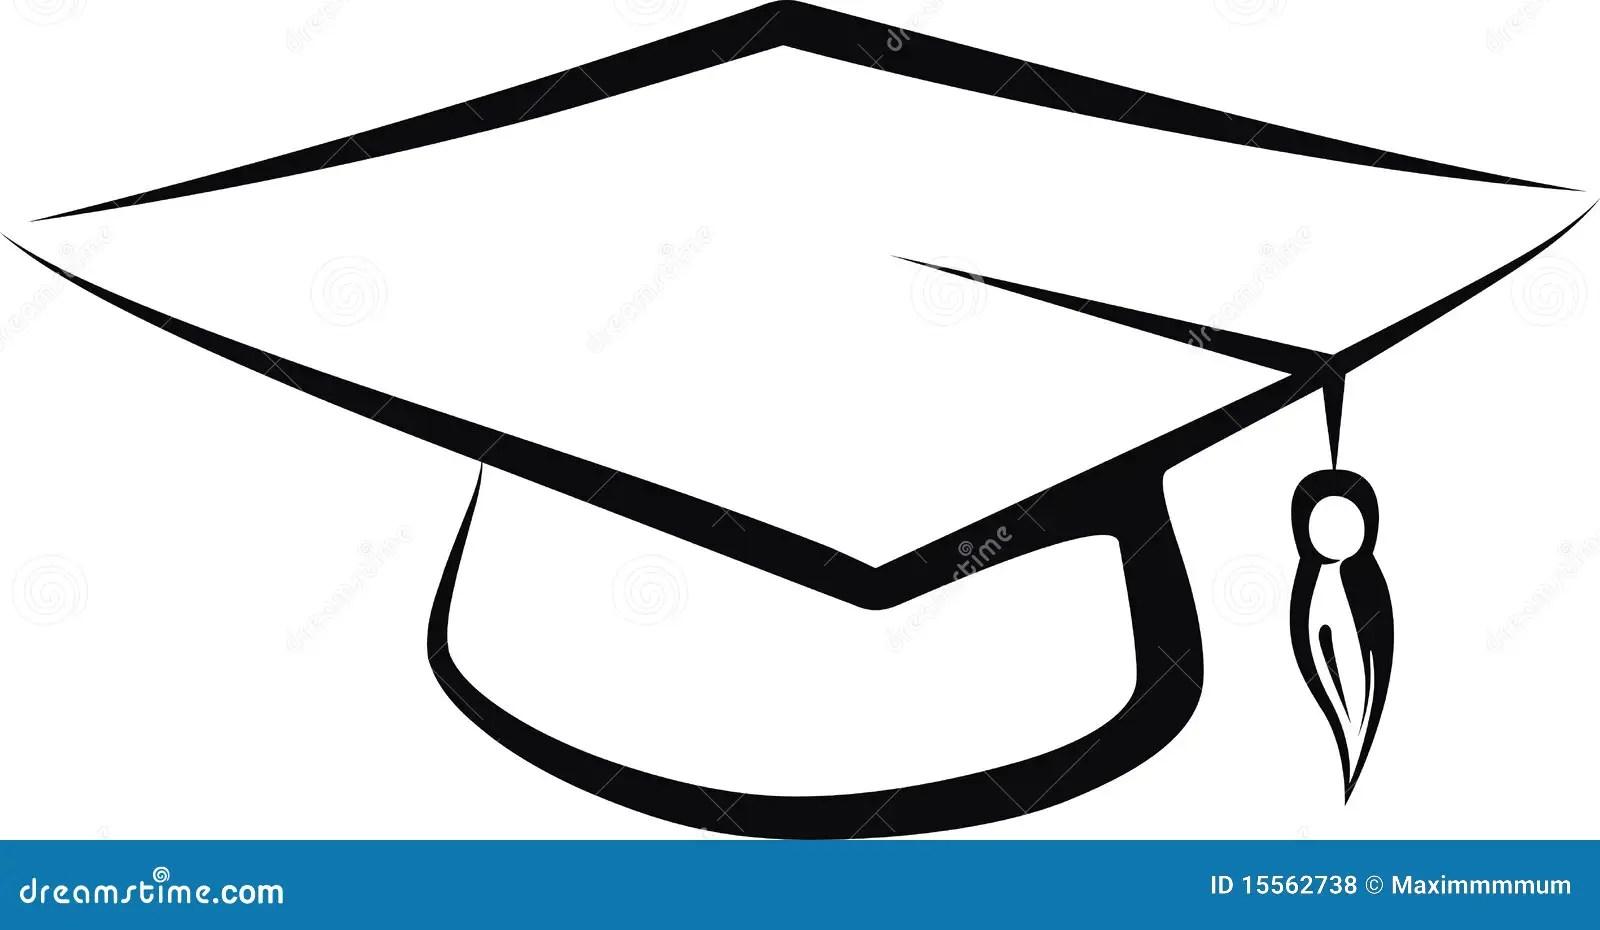 Graduate cap stock vector. Illustration of secondary